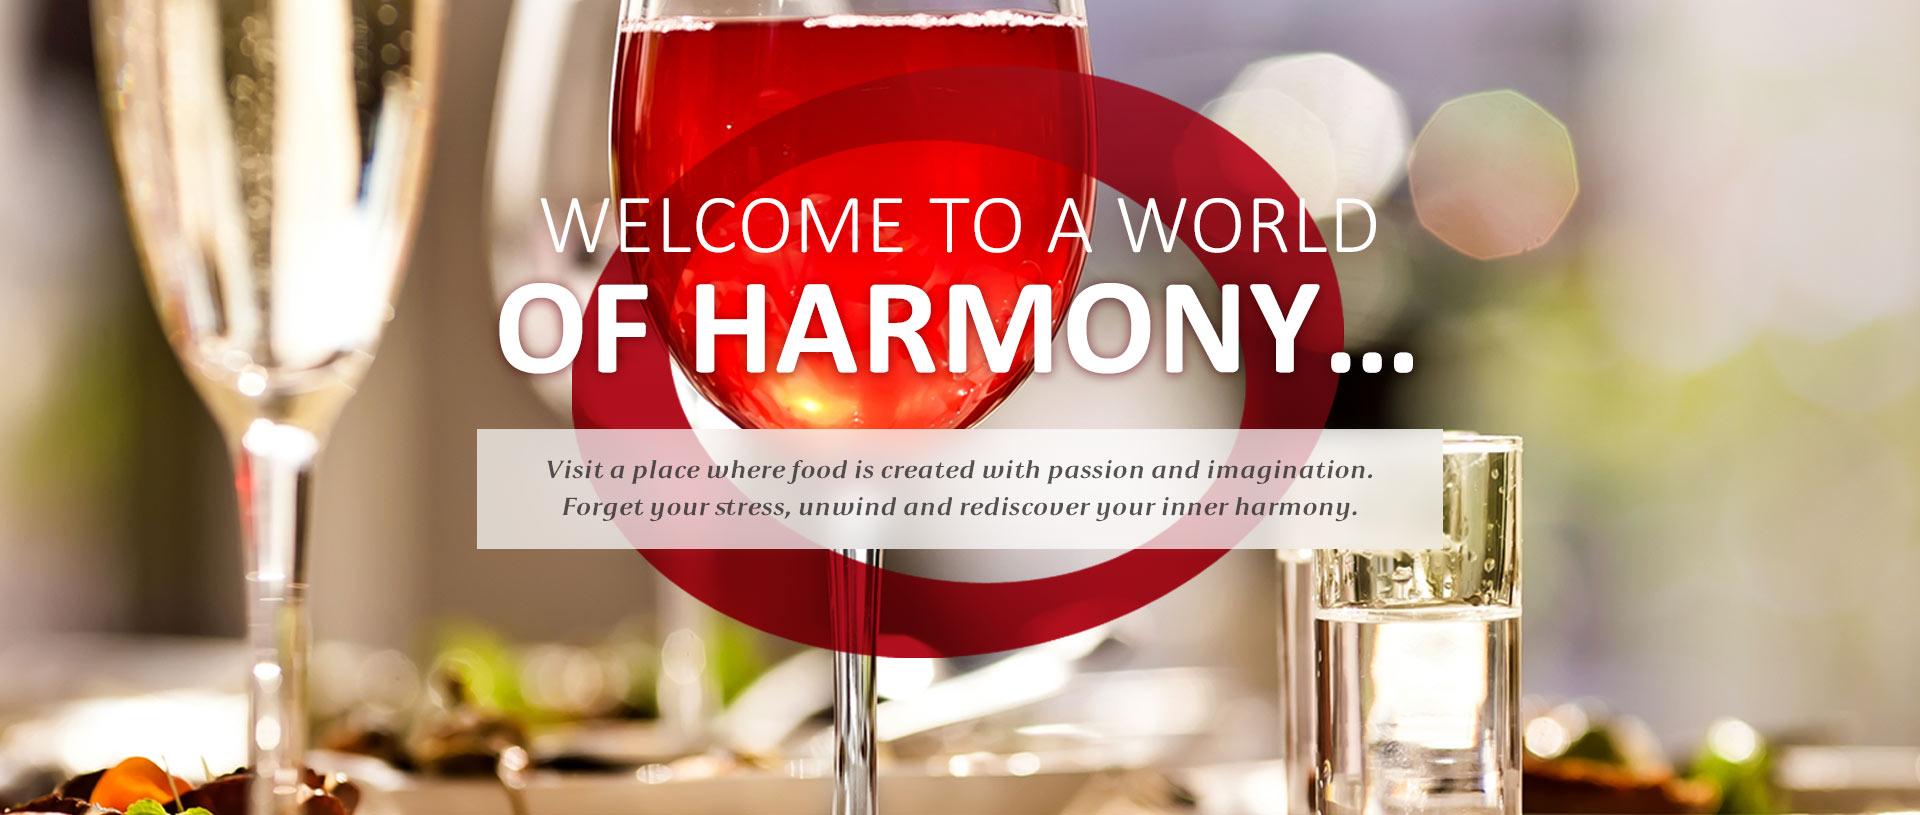 Harmony Restaurant - Third slider image